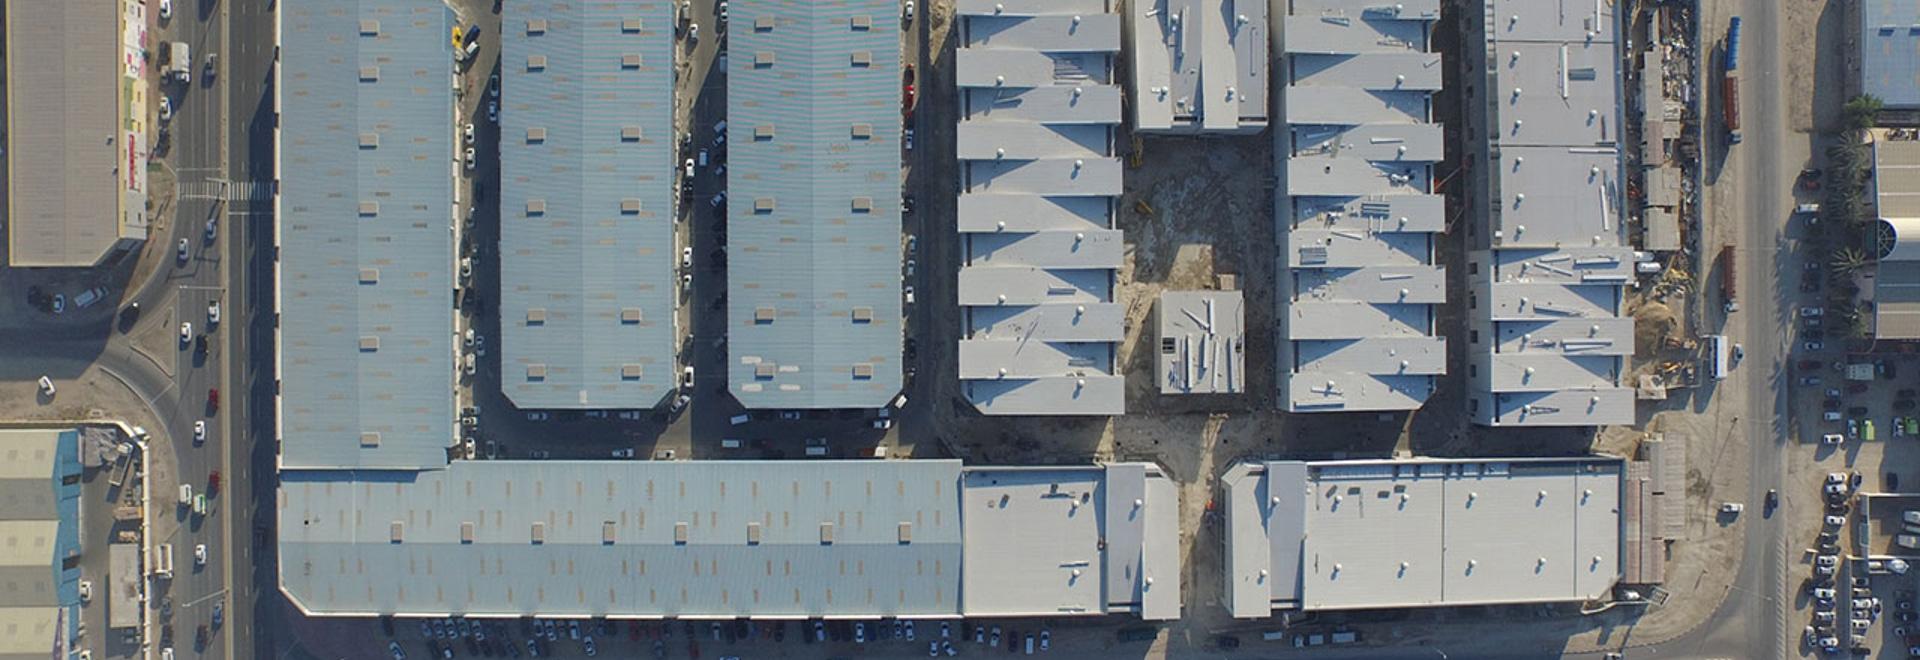 Alserkal Avenue aerial view. Photo courtesy Alserkal Avenue.